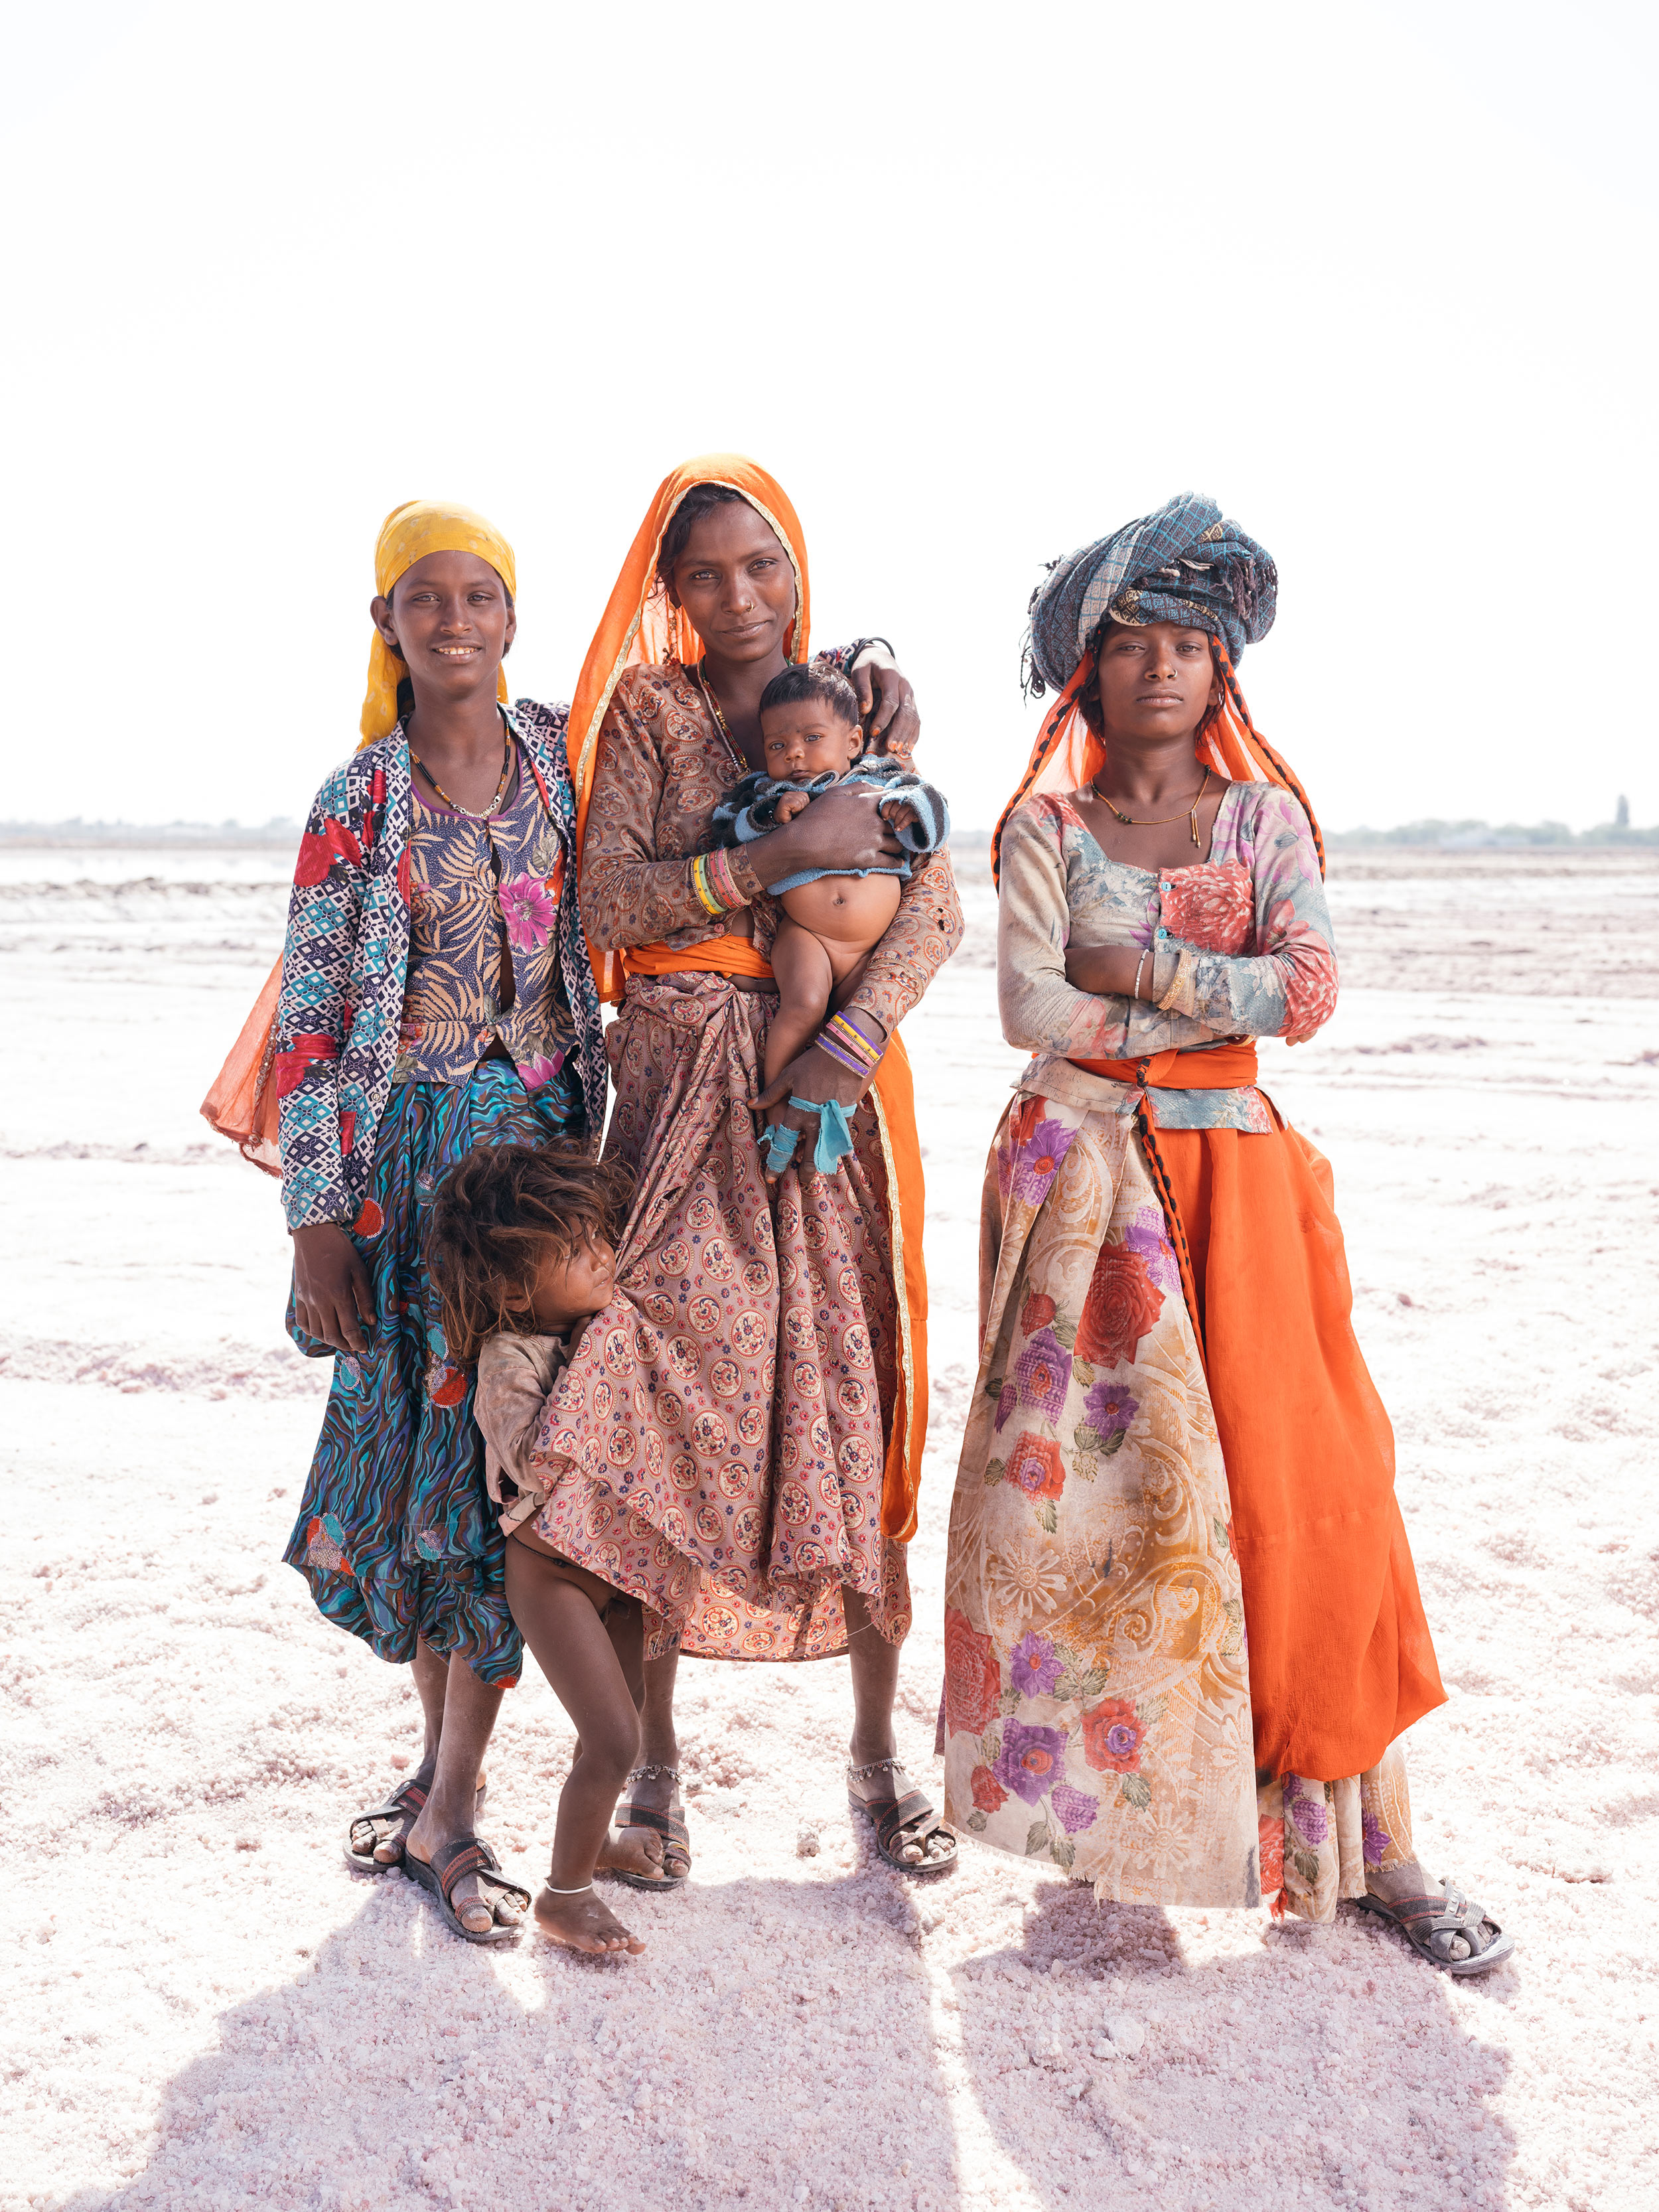 India_SaltFlats_0038_05901.jpg